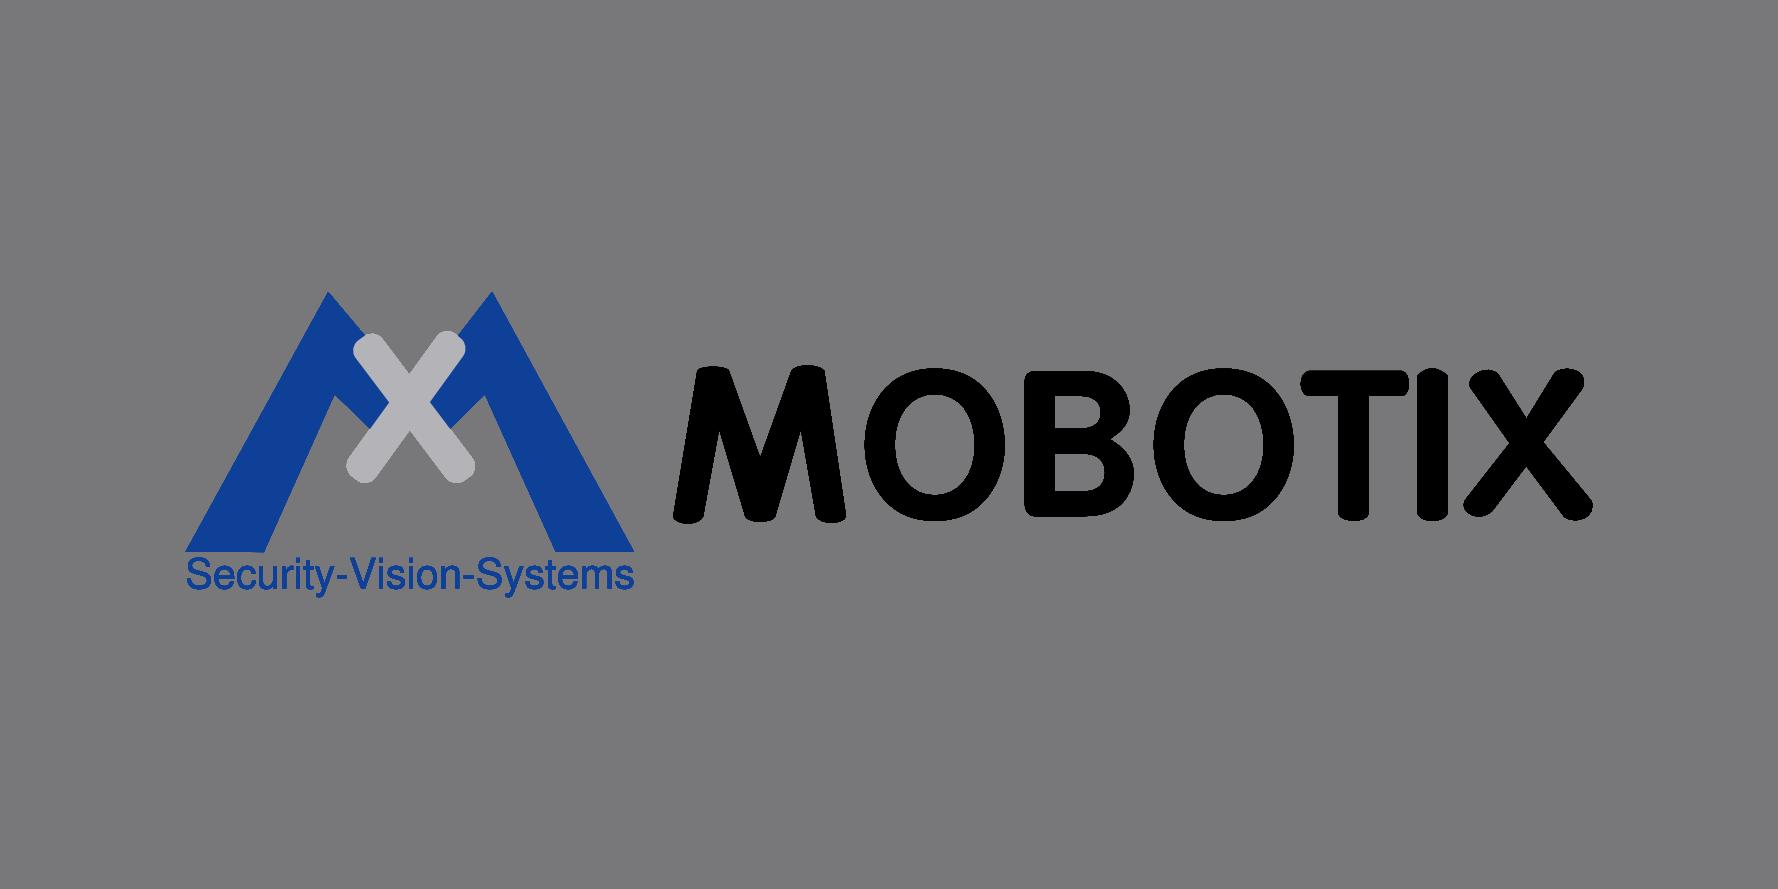 cctv CCTV Sistemas de Videovigilancia logo mobotix